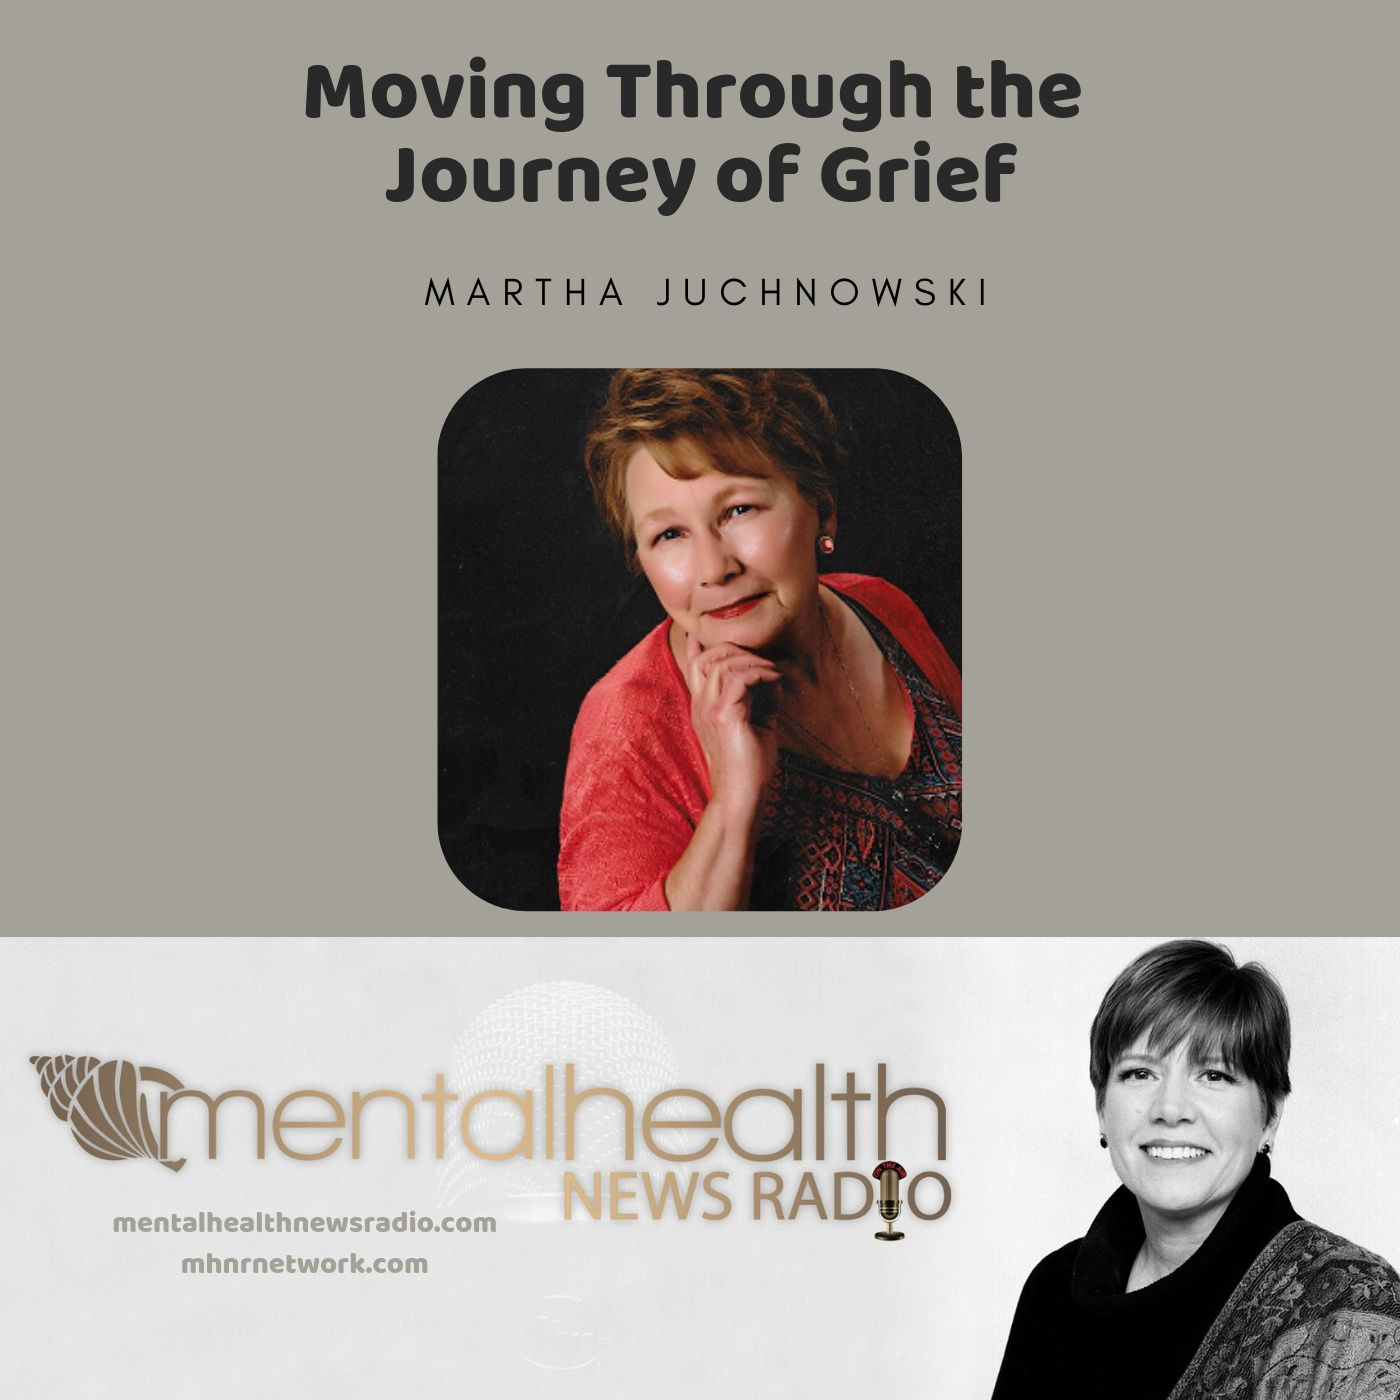 Mental Health News Radio - Martha Juchnowski: Moving Through the Journey of Grief